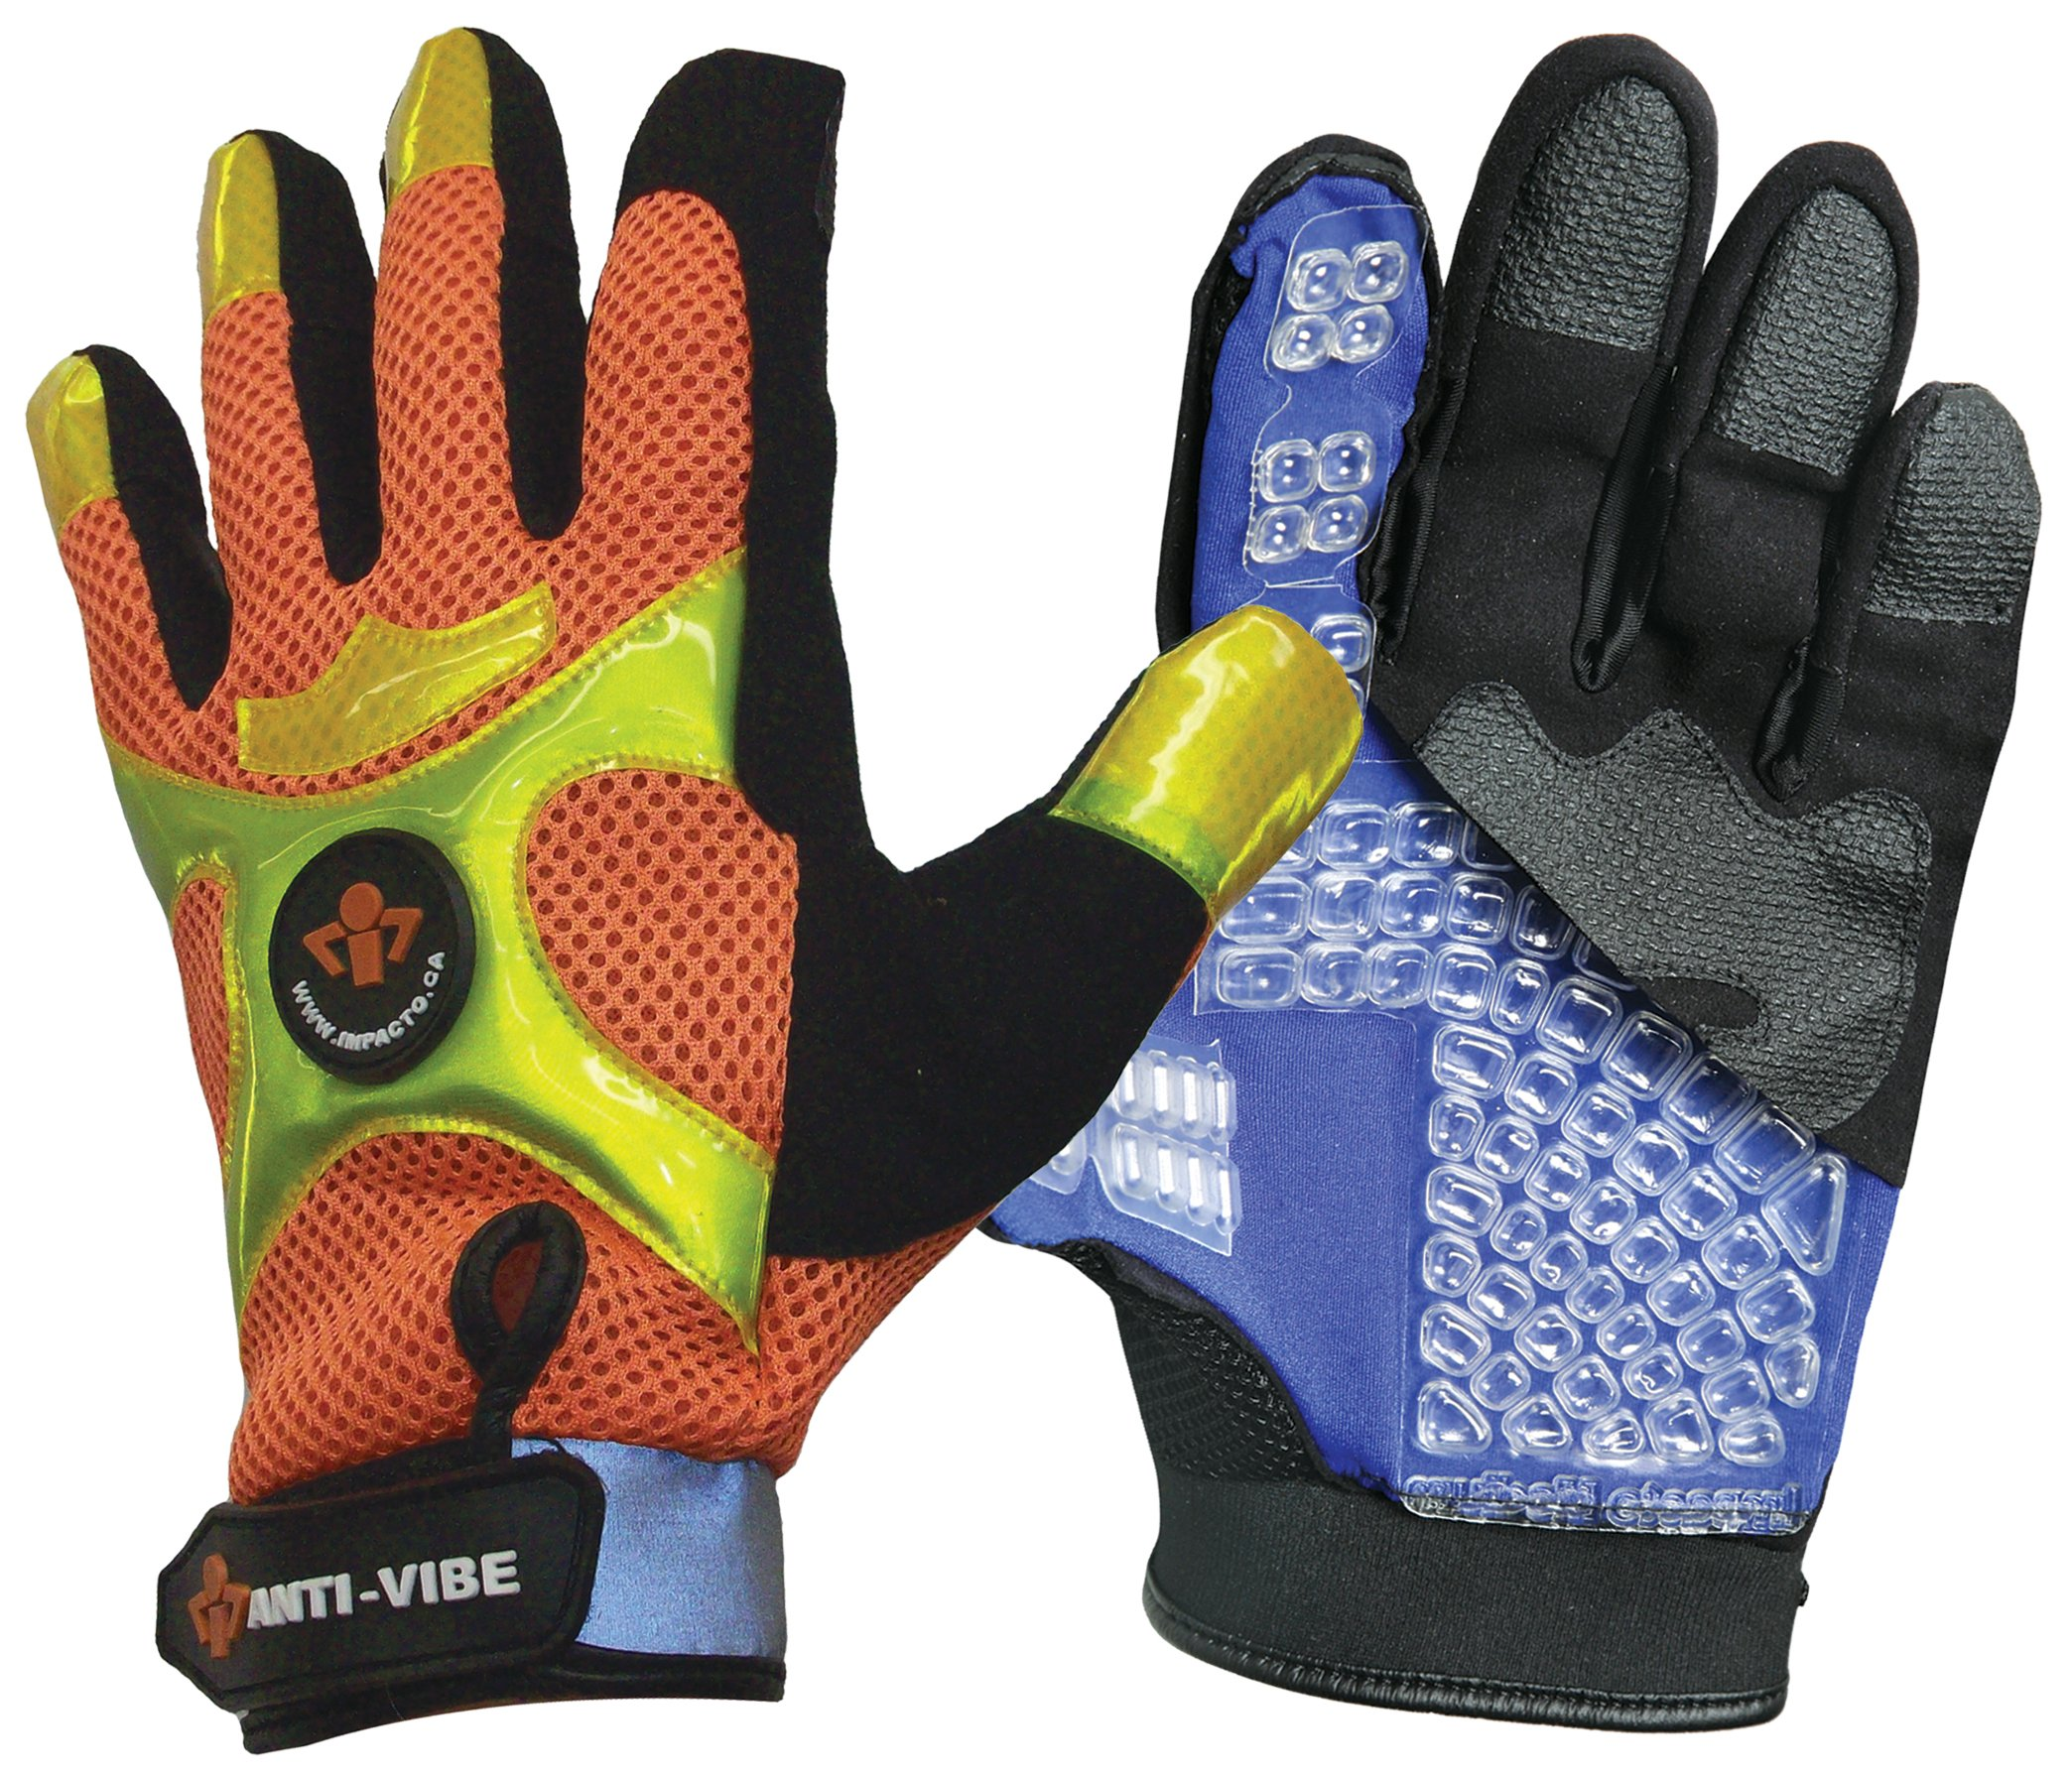 Impacto BGHIVIS30 Anti-Vibration High Visibility Mechanic's Air Glove, Orange/Black